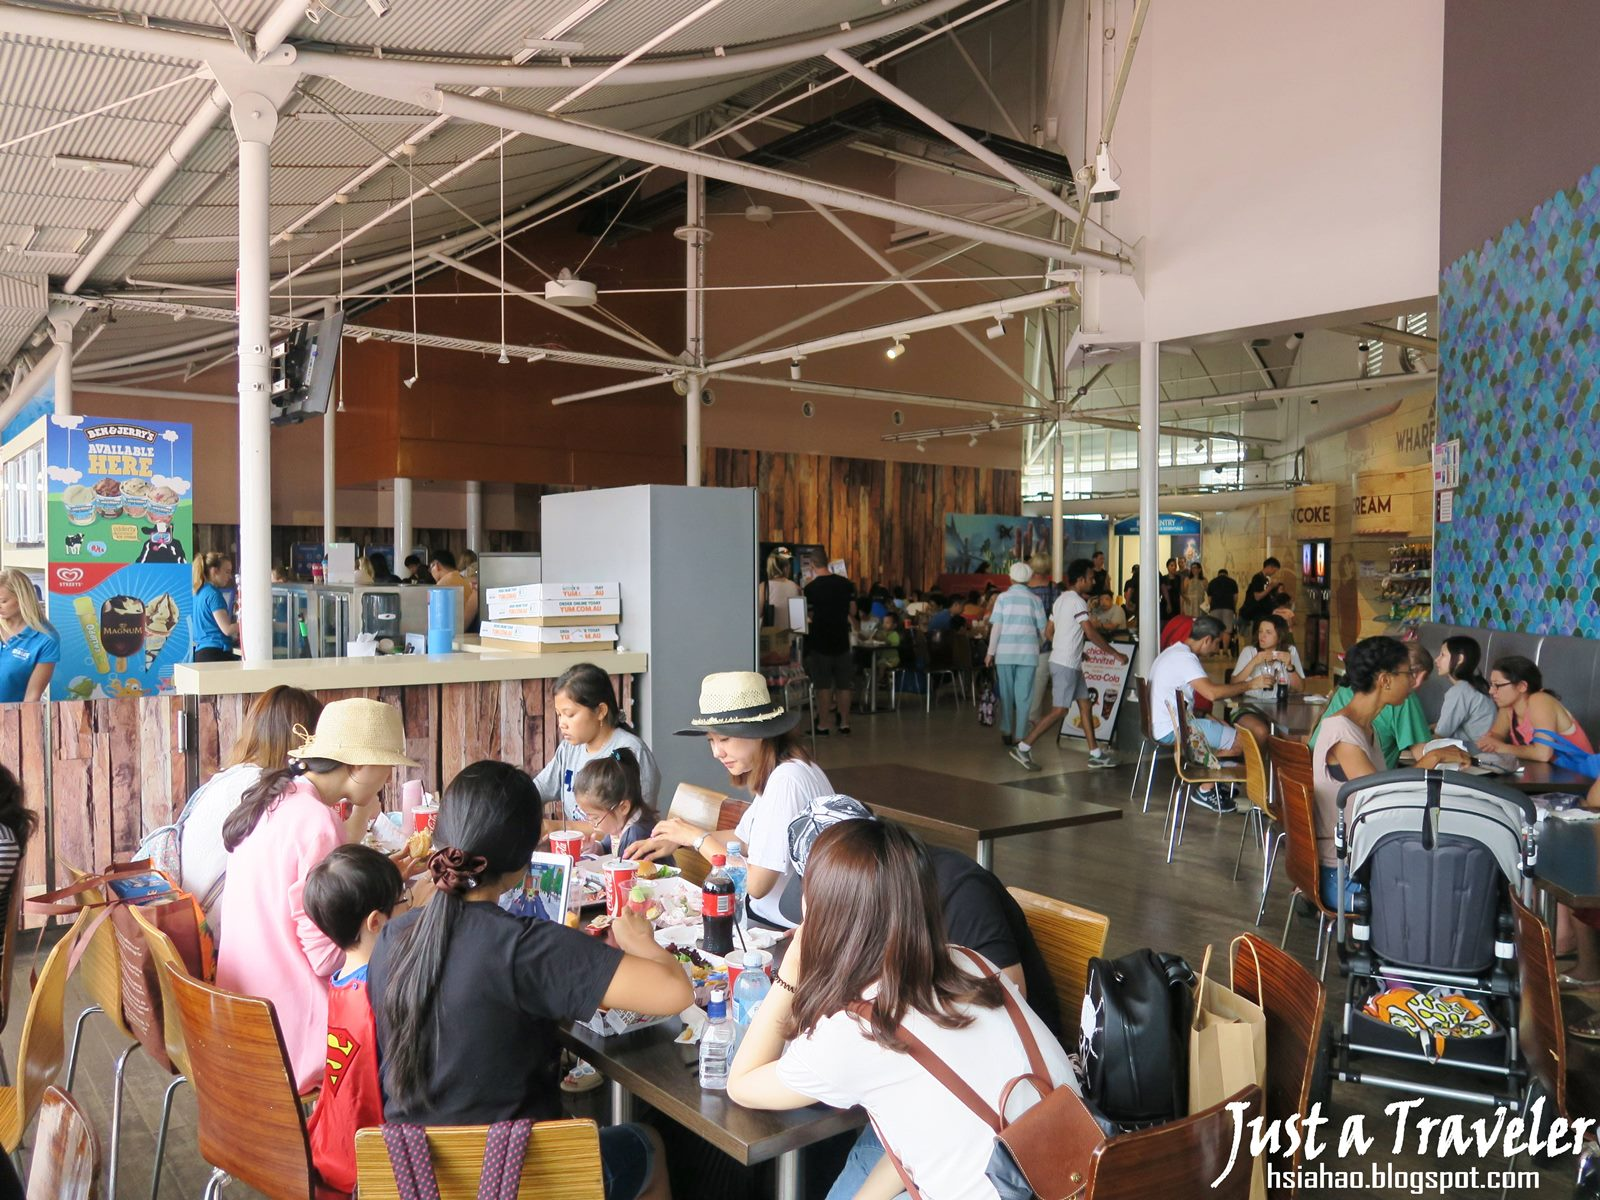 雪梨-景點-推薦-達令港-自由行-行程-旅遊-澳洲-Sydney-Darling-Harbour-Tourist-Attraction-Travel